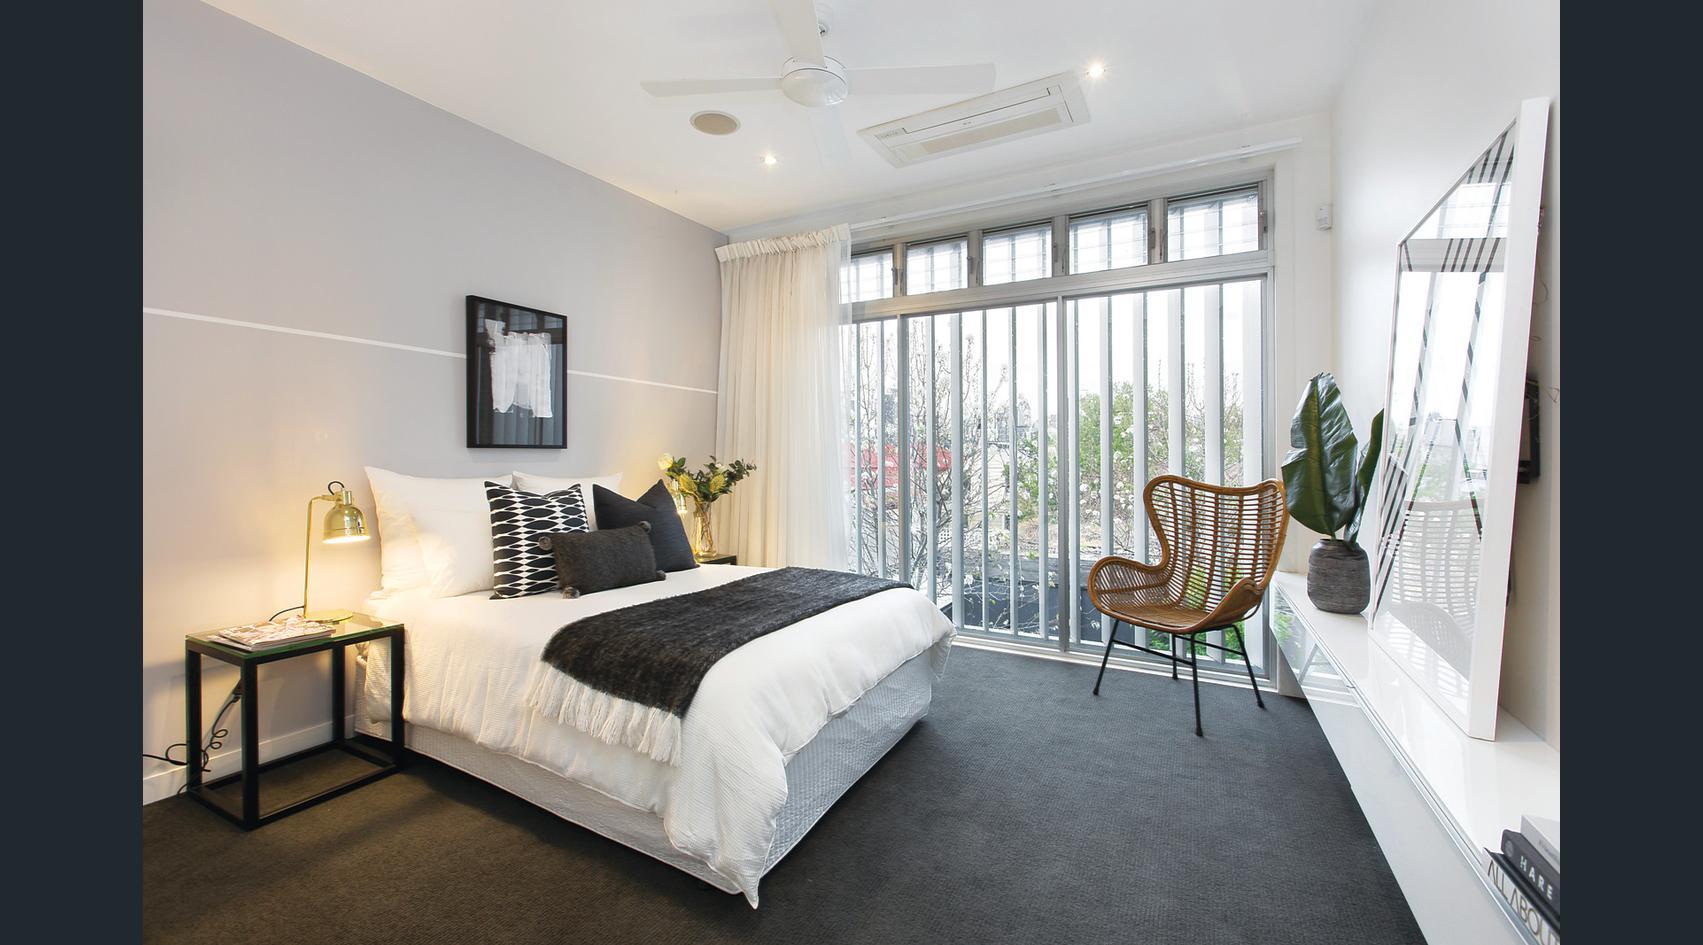 178-farrell-street-port-melbourne-student-accommodation-Melbourne-Bedroom3-Unilodgers